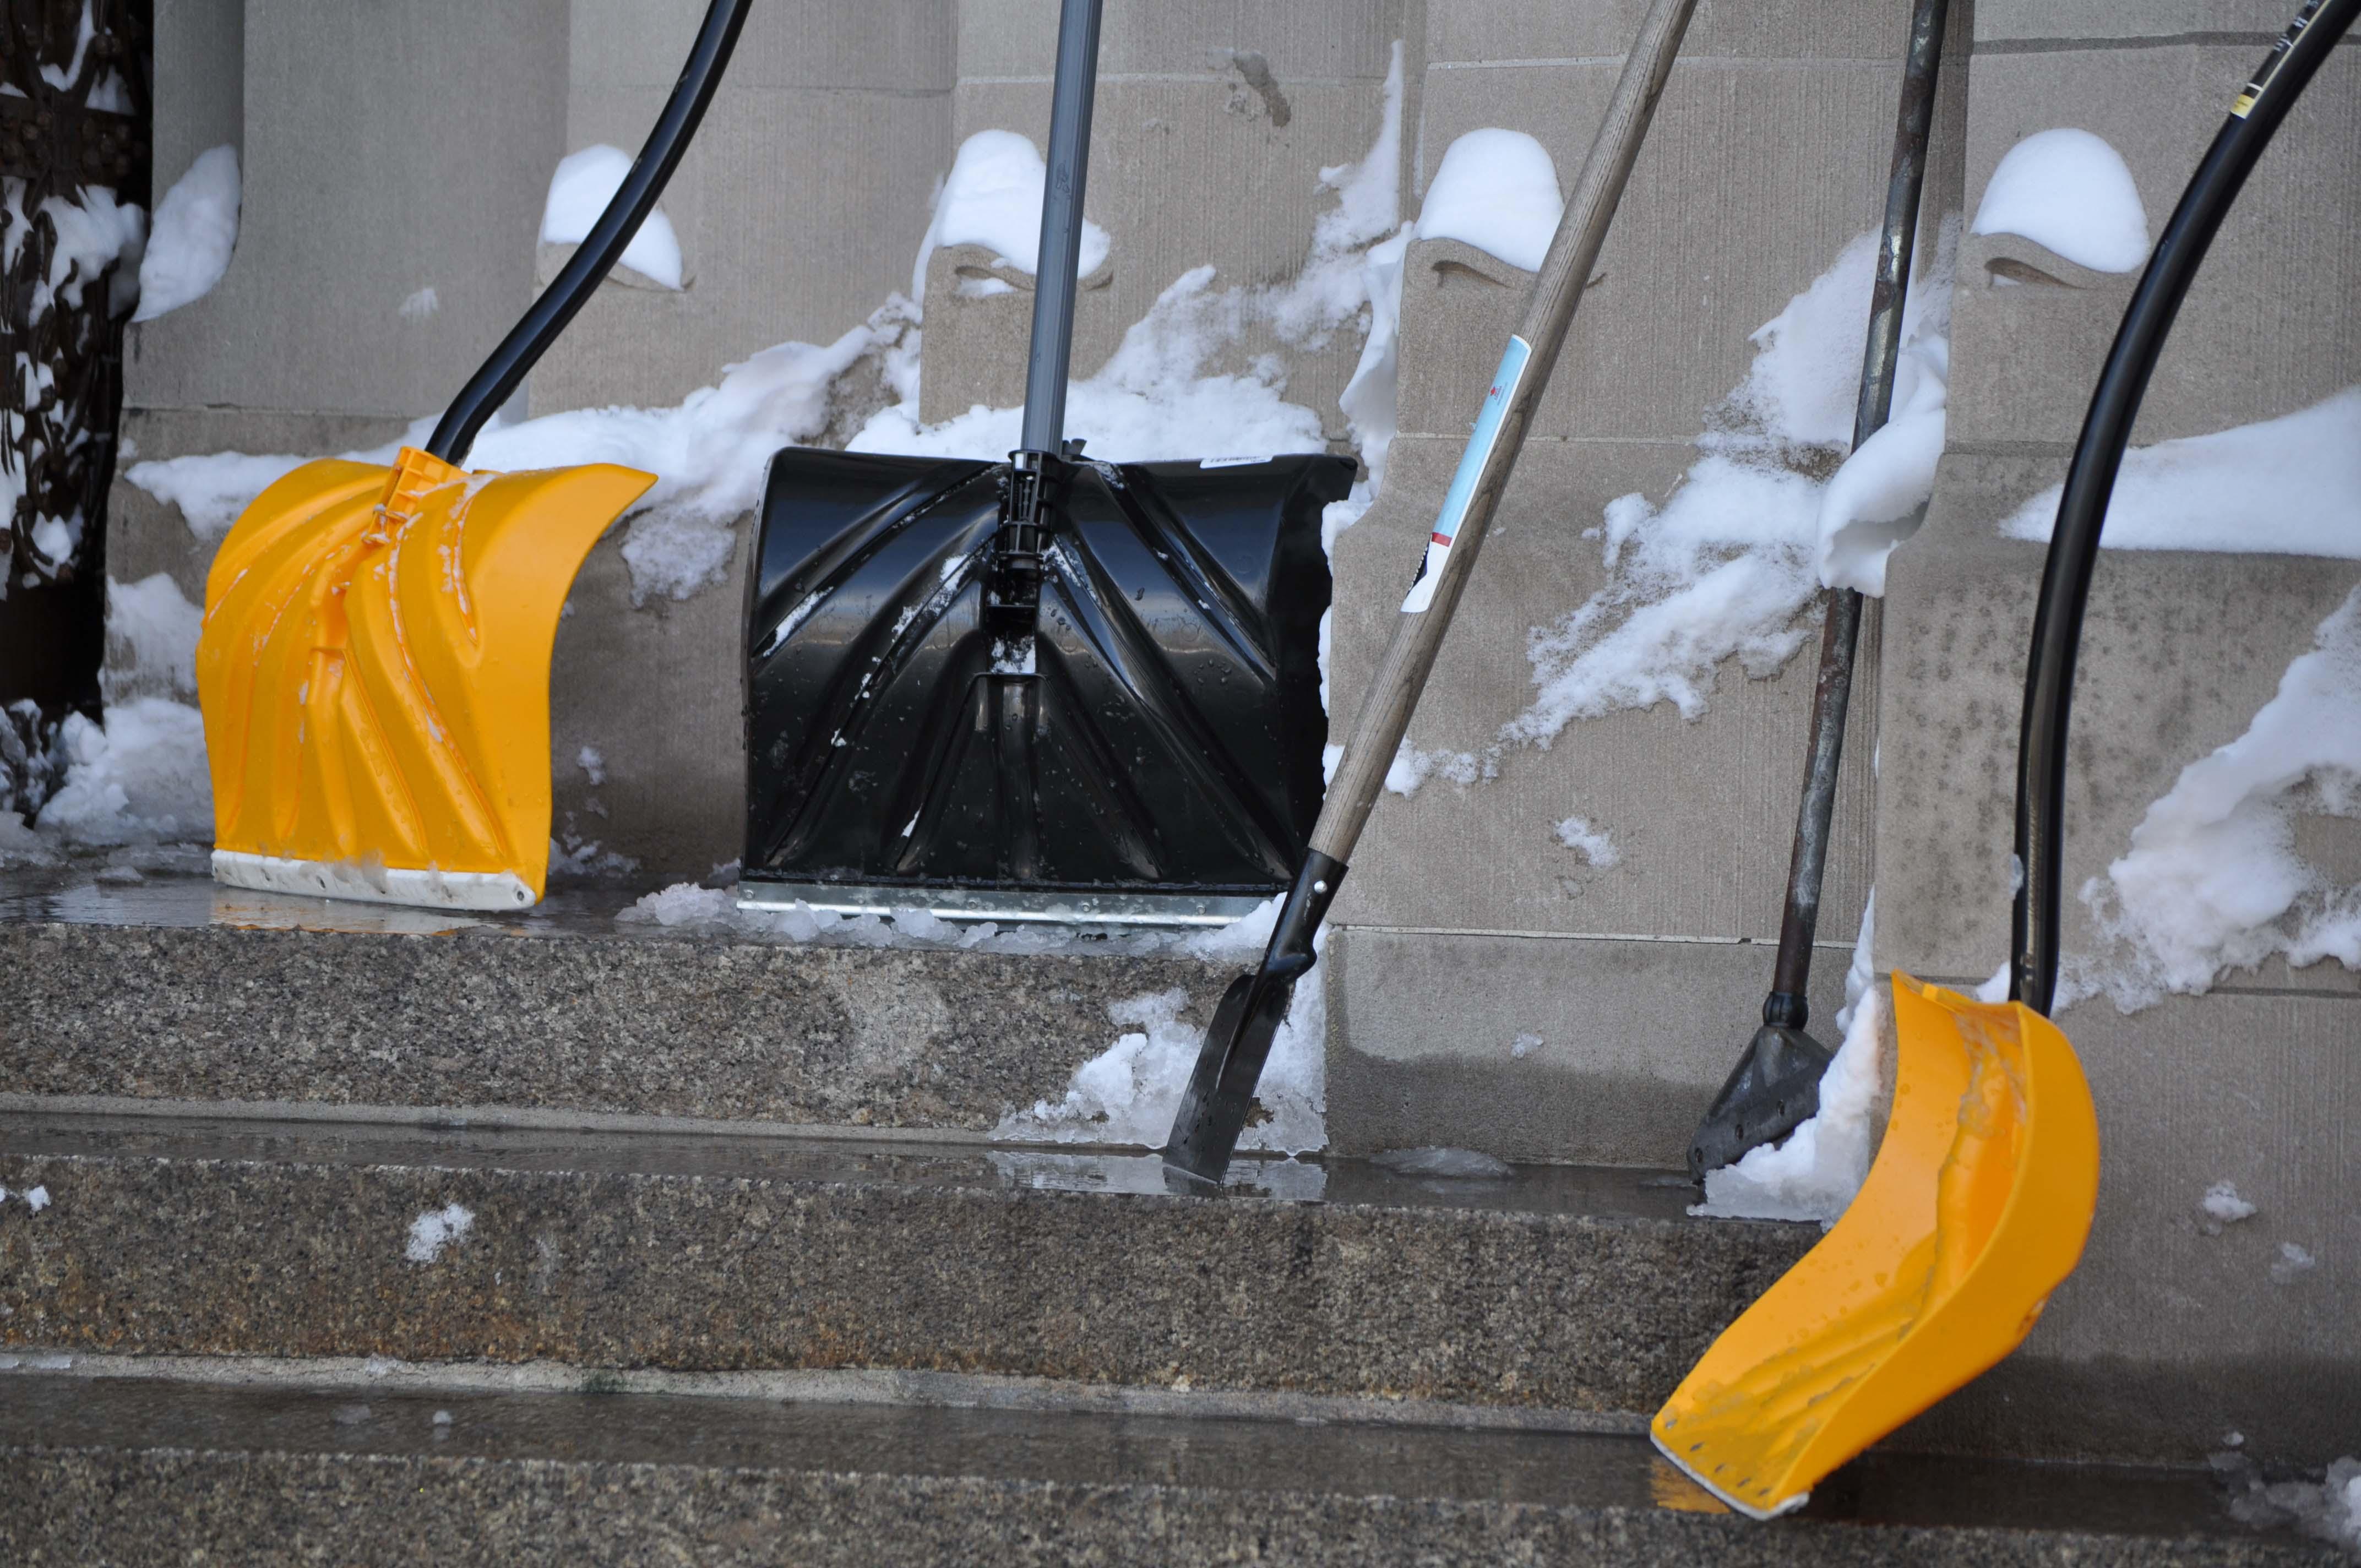 Yellow & black shovels